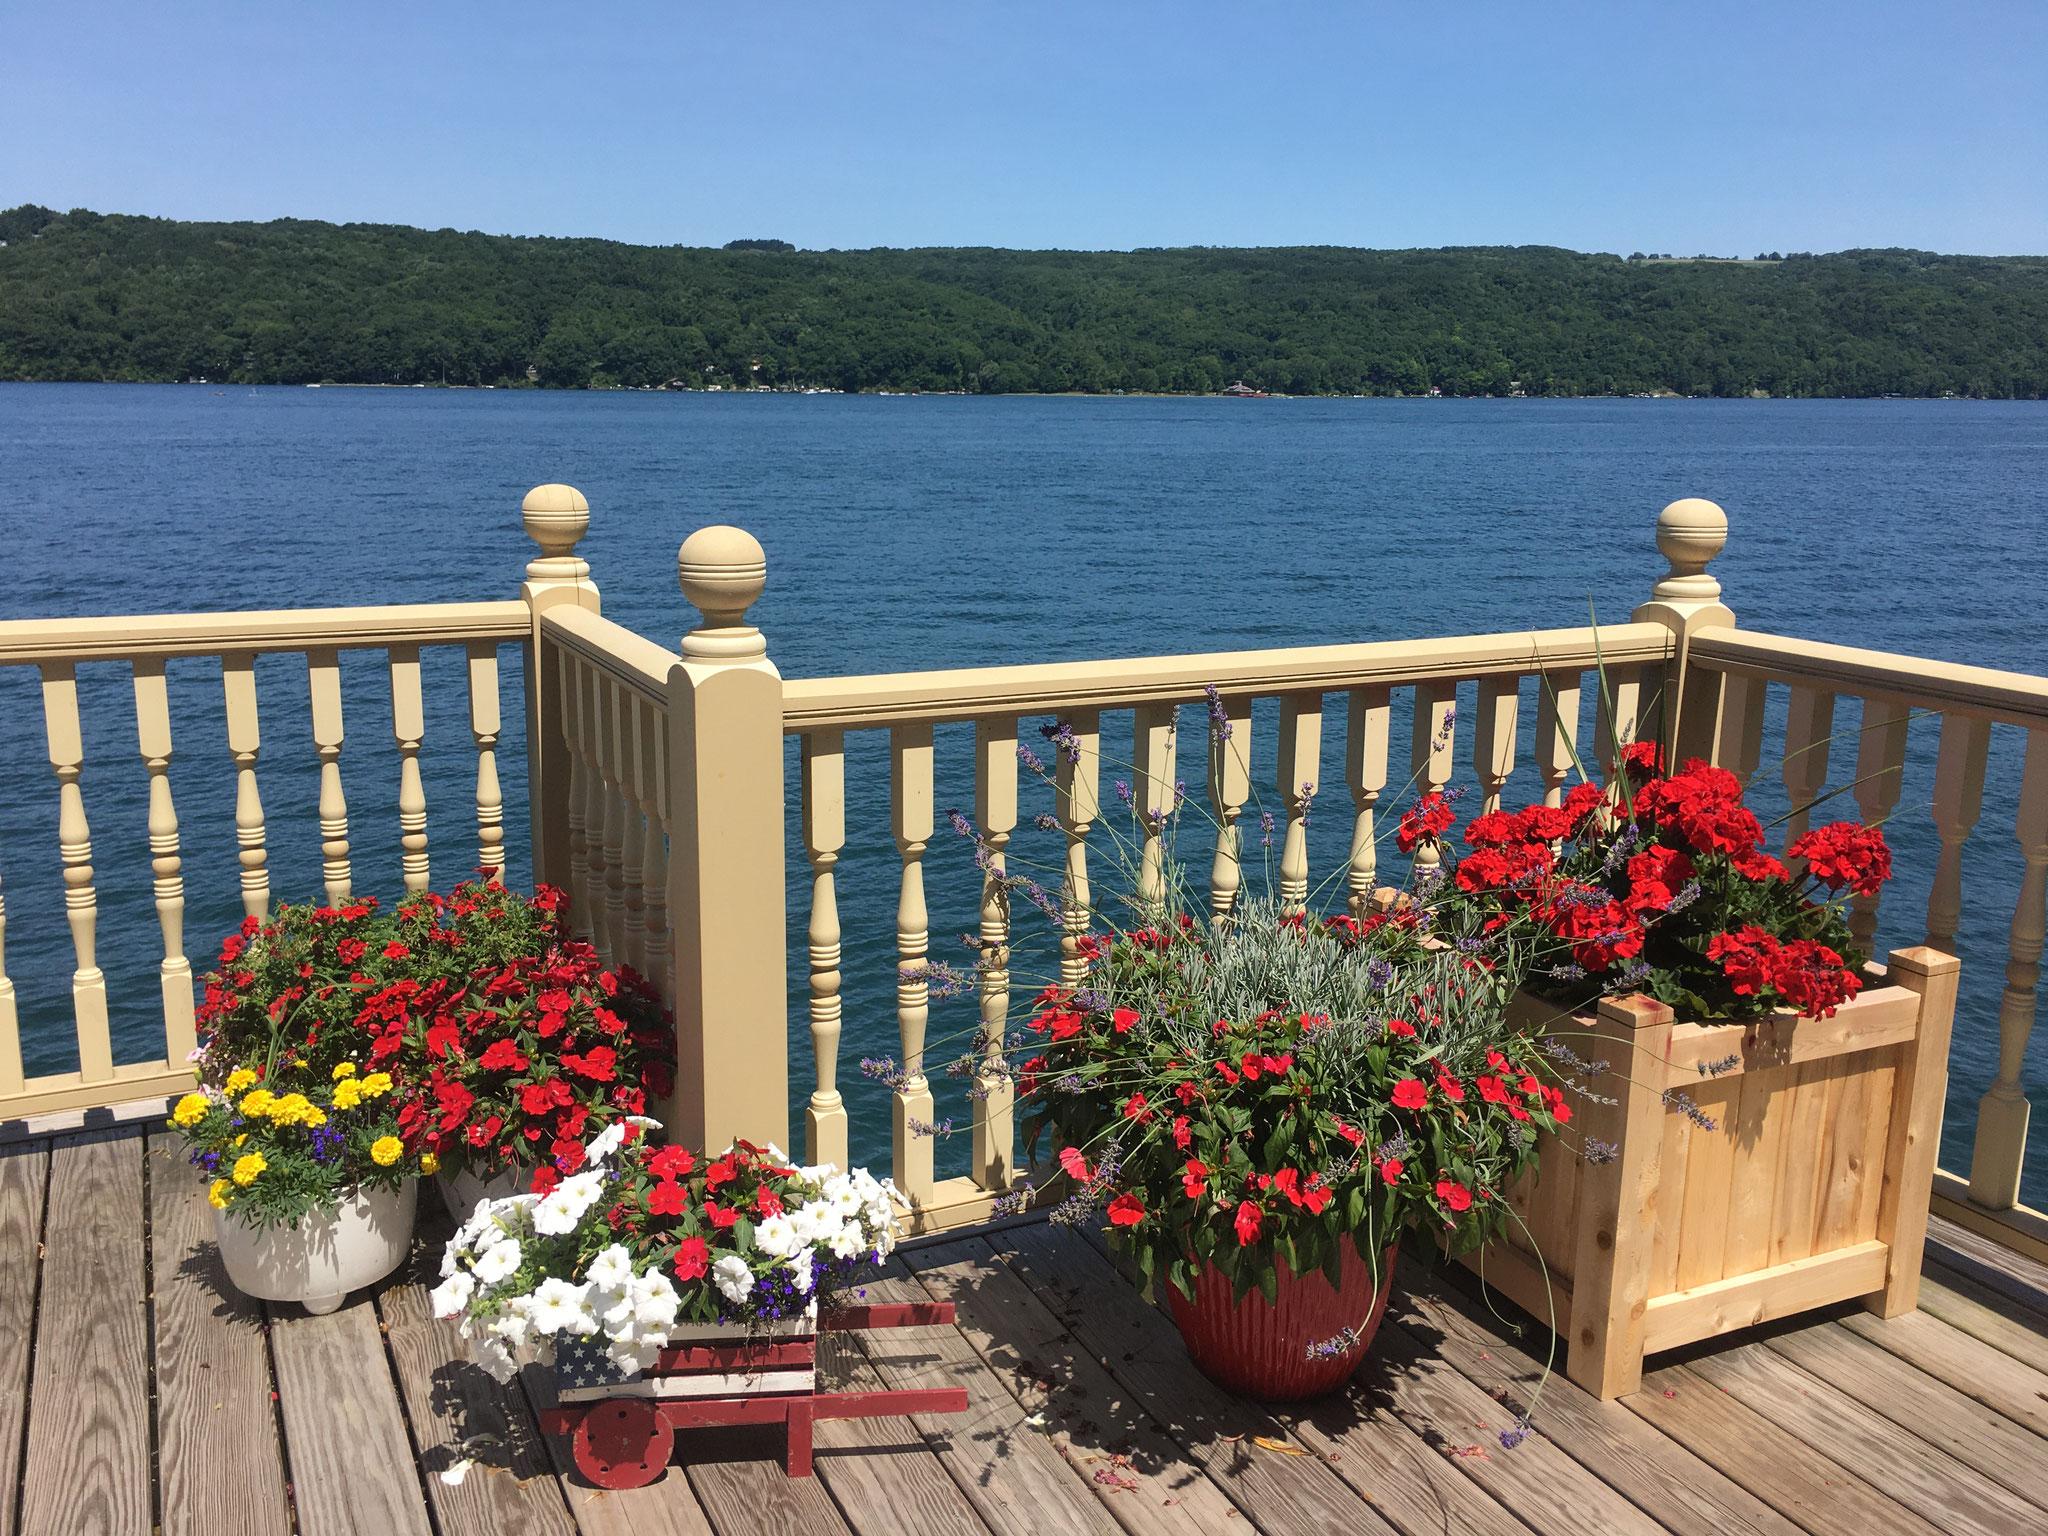 Beautiful flowers at the boathouse, Skaneateles Lake, 8-2020